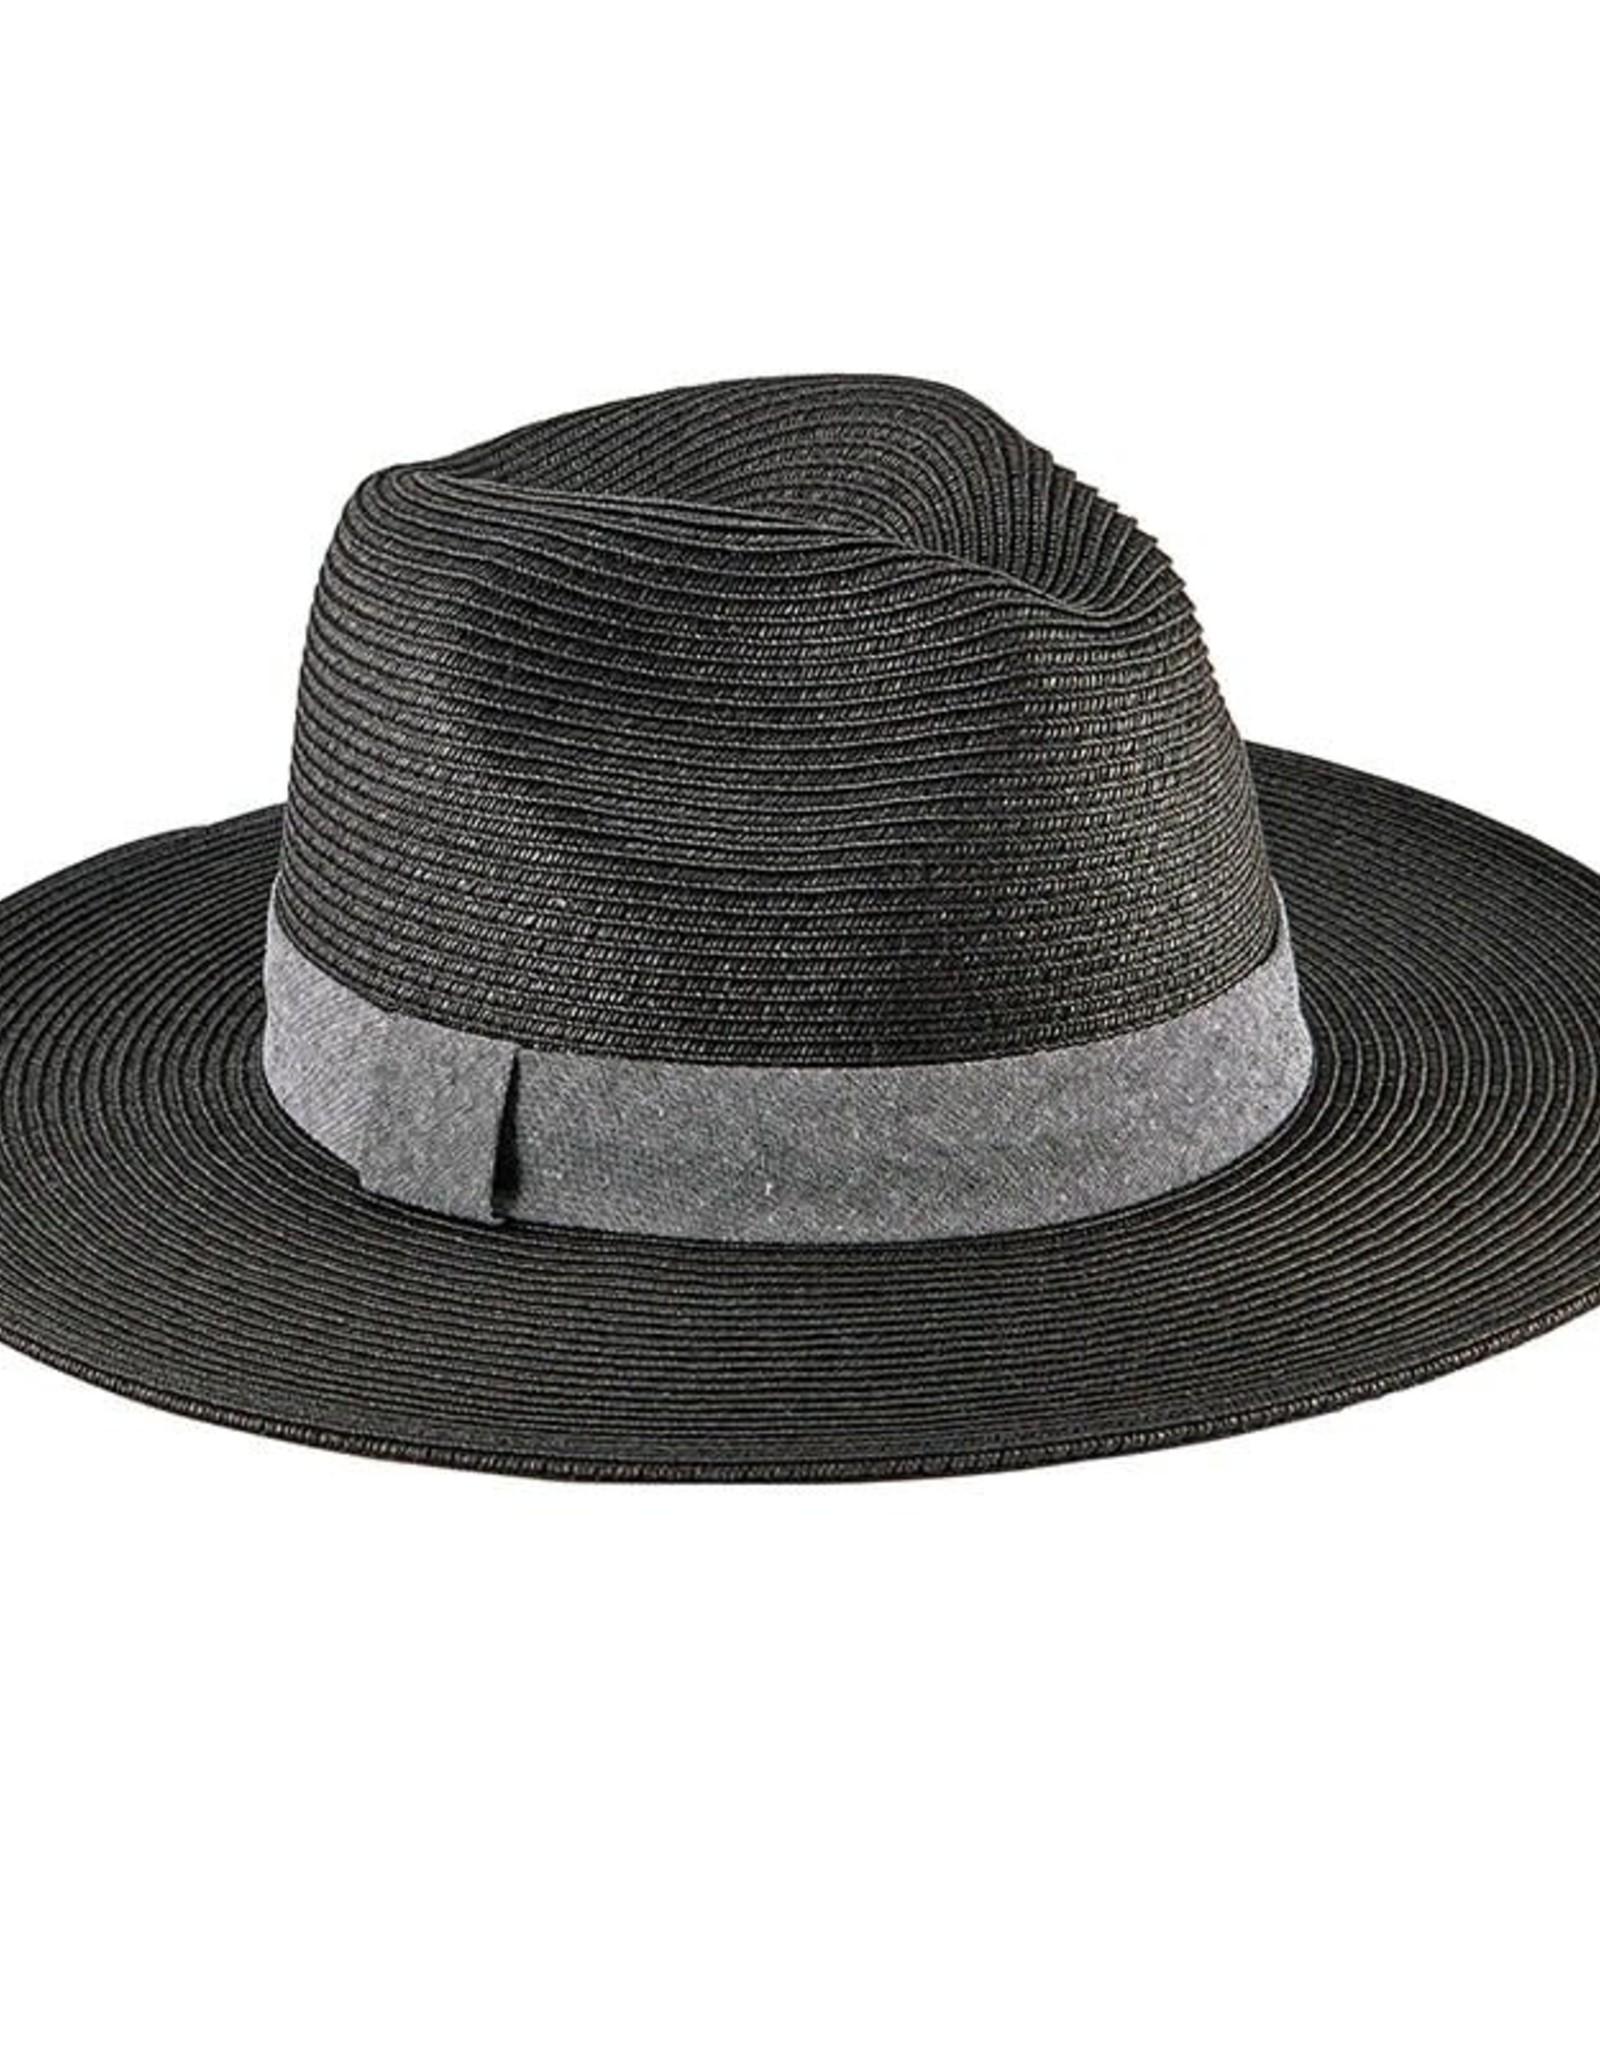 SAN DIEGO HAT Ultrabraid Fedora with Chambray Band - Black